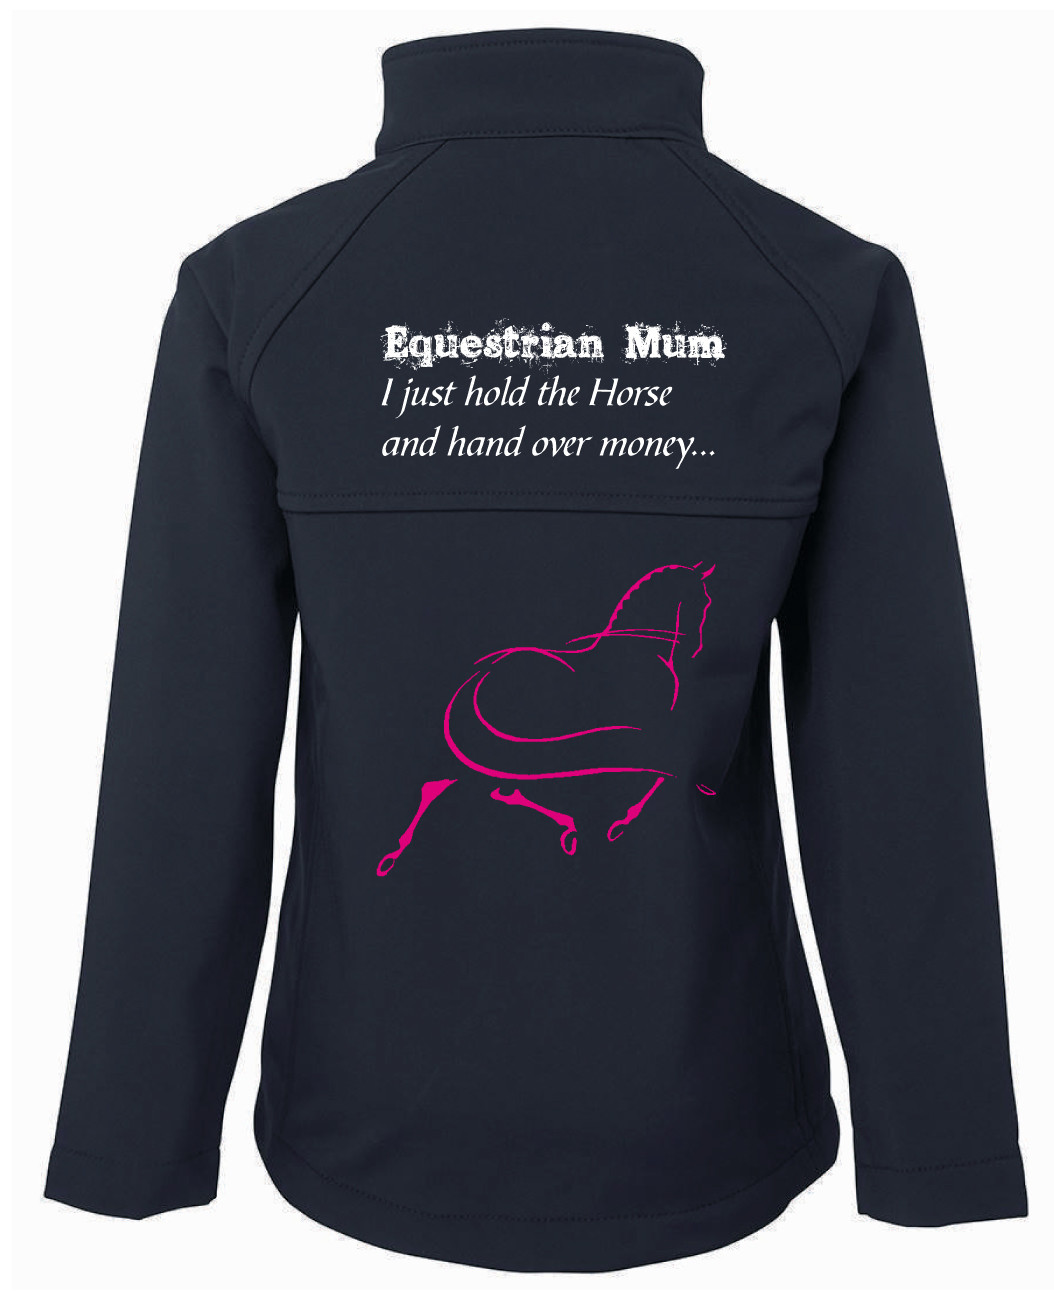 """Equestrian Mum"" Jacket - Ladies Soft Shell Jacket"